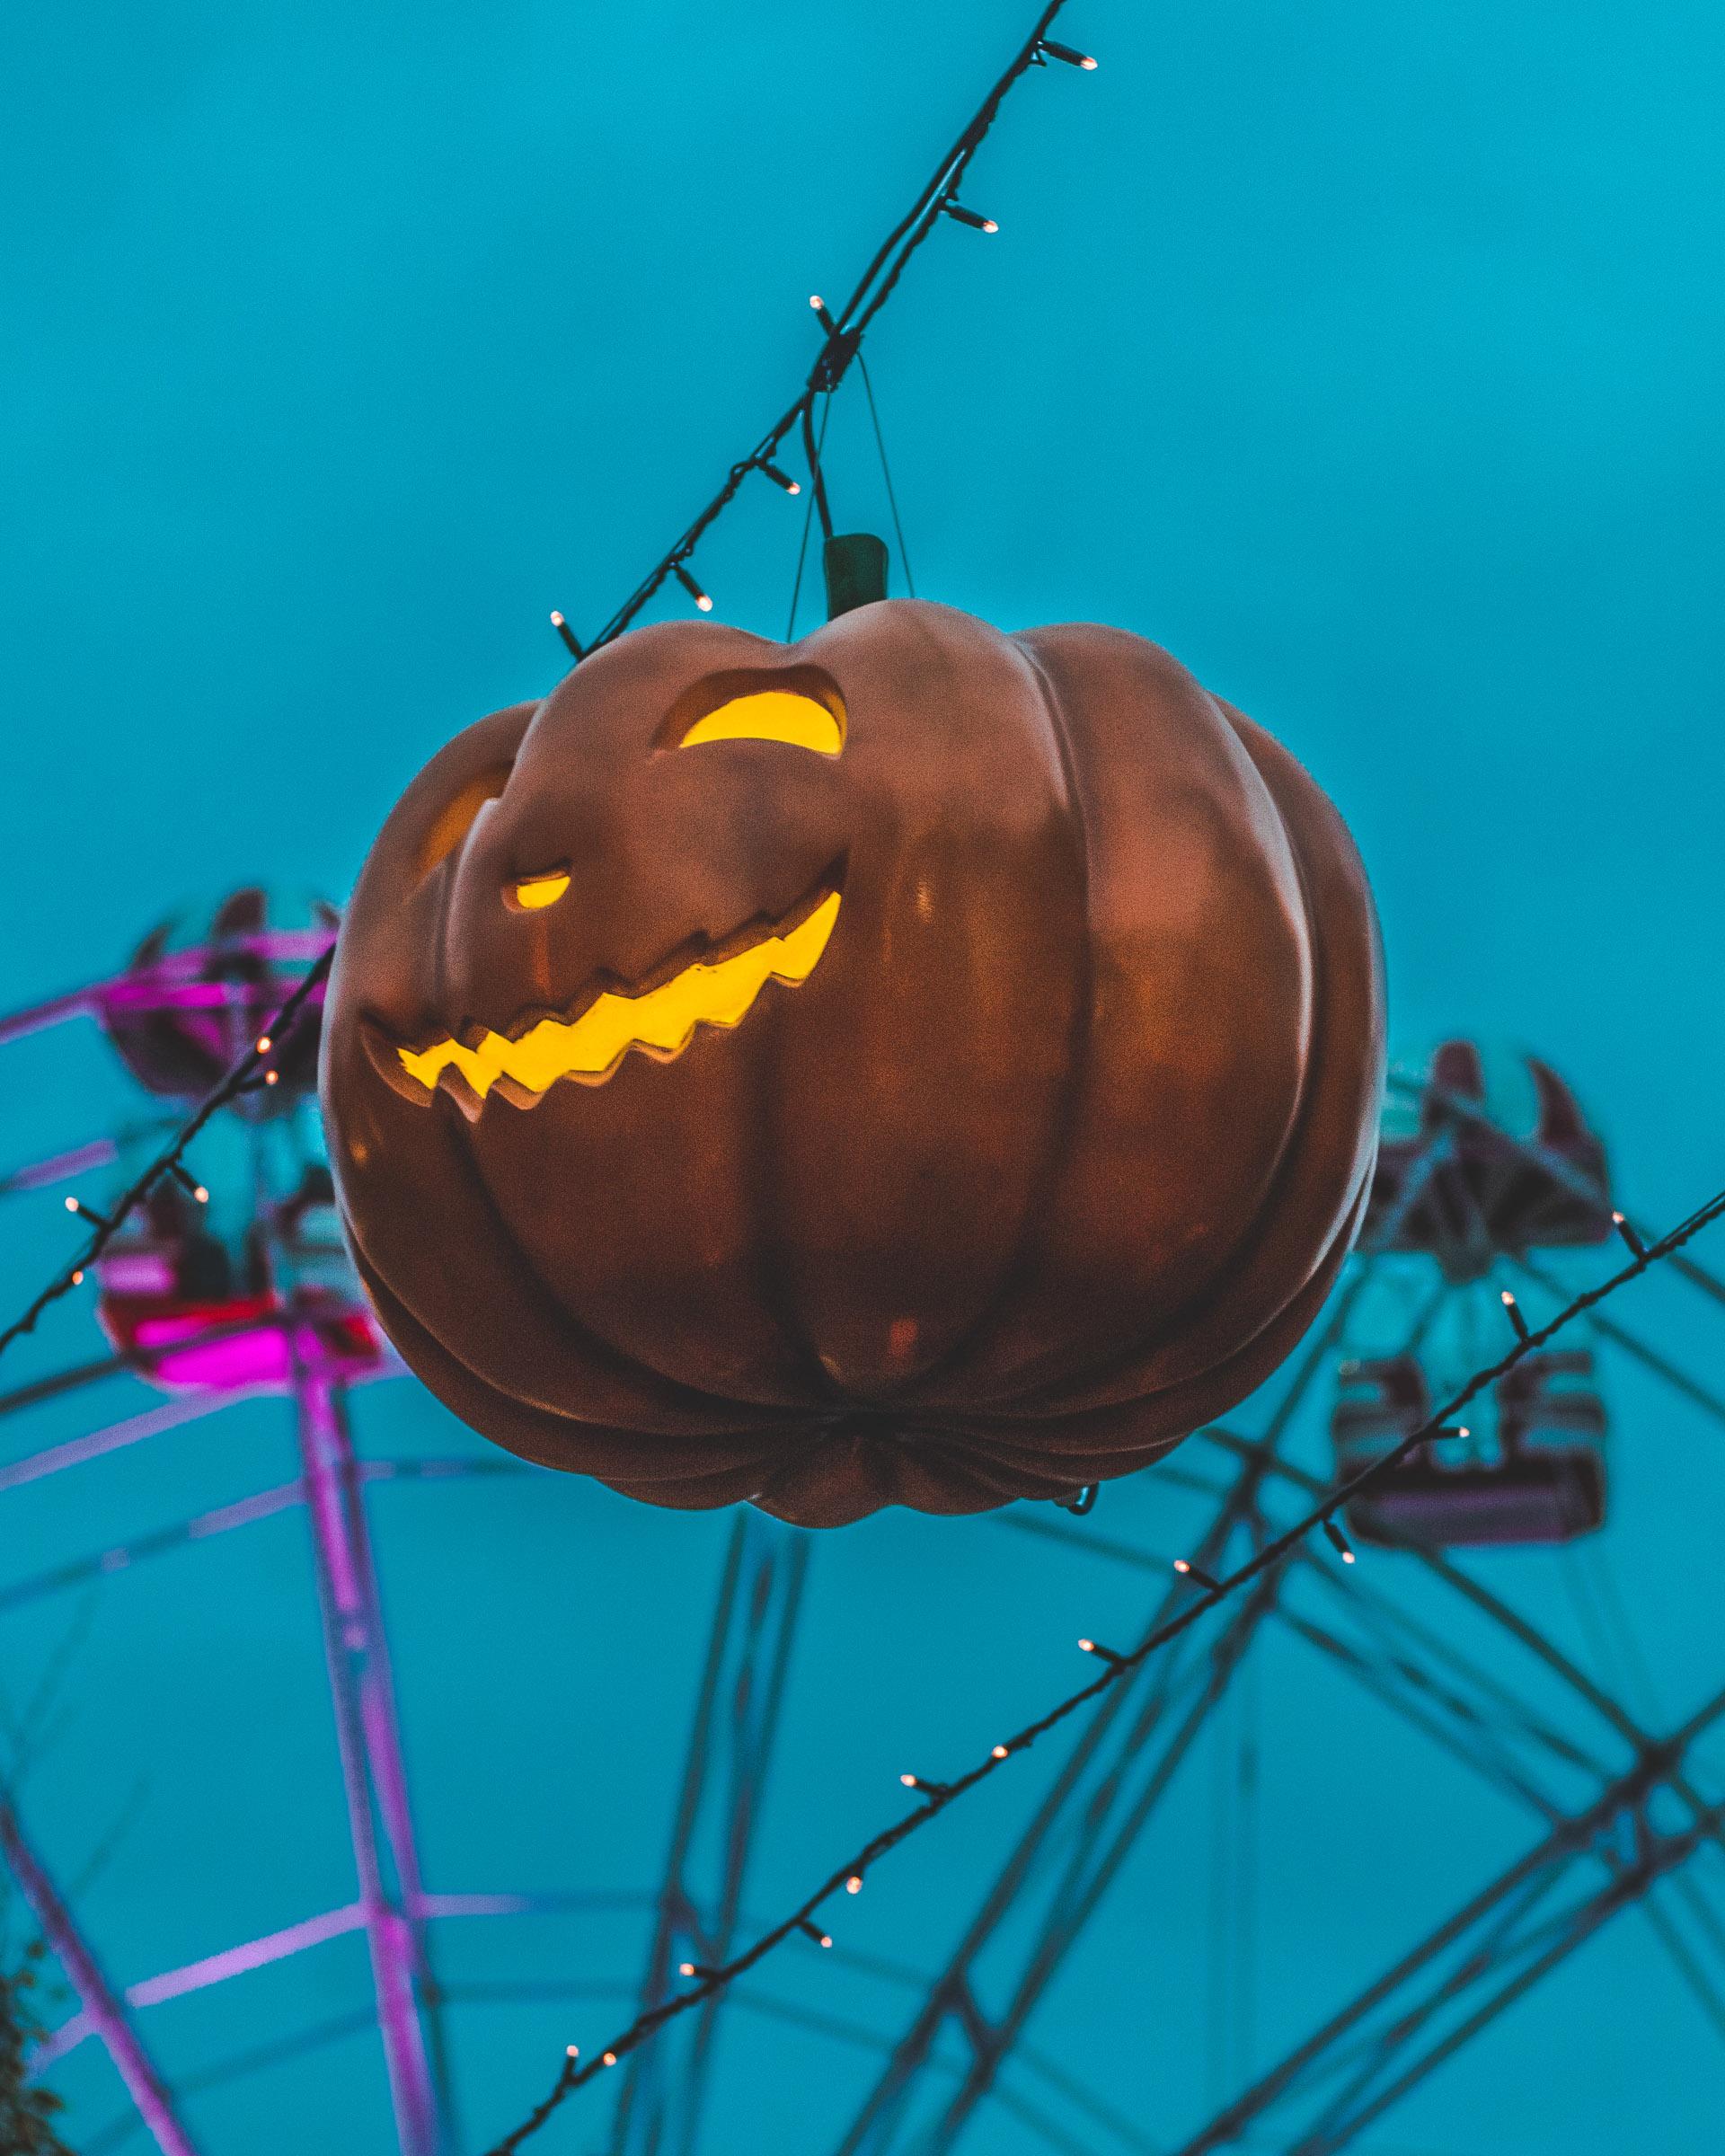 Halloween 2019: (U)hyggen spreder sig i Tivoli Friheden